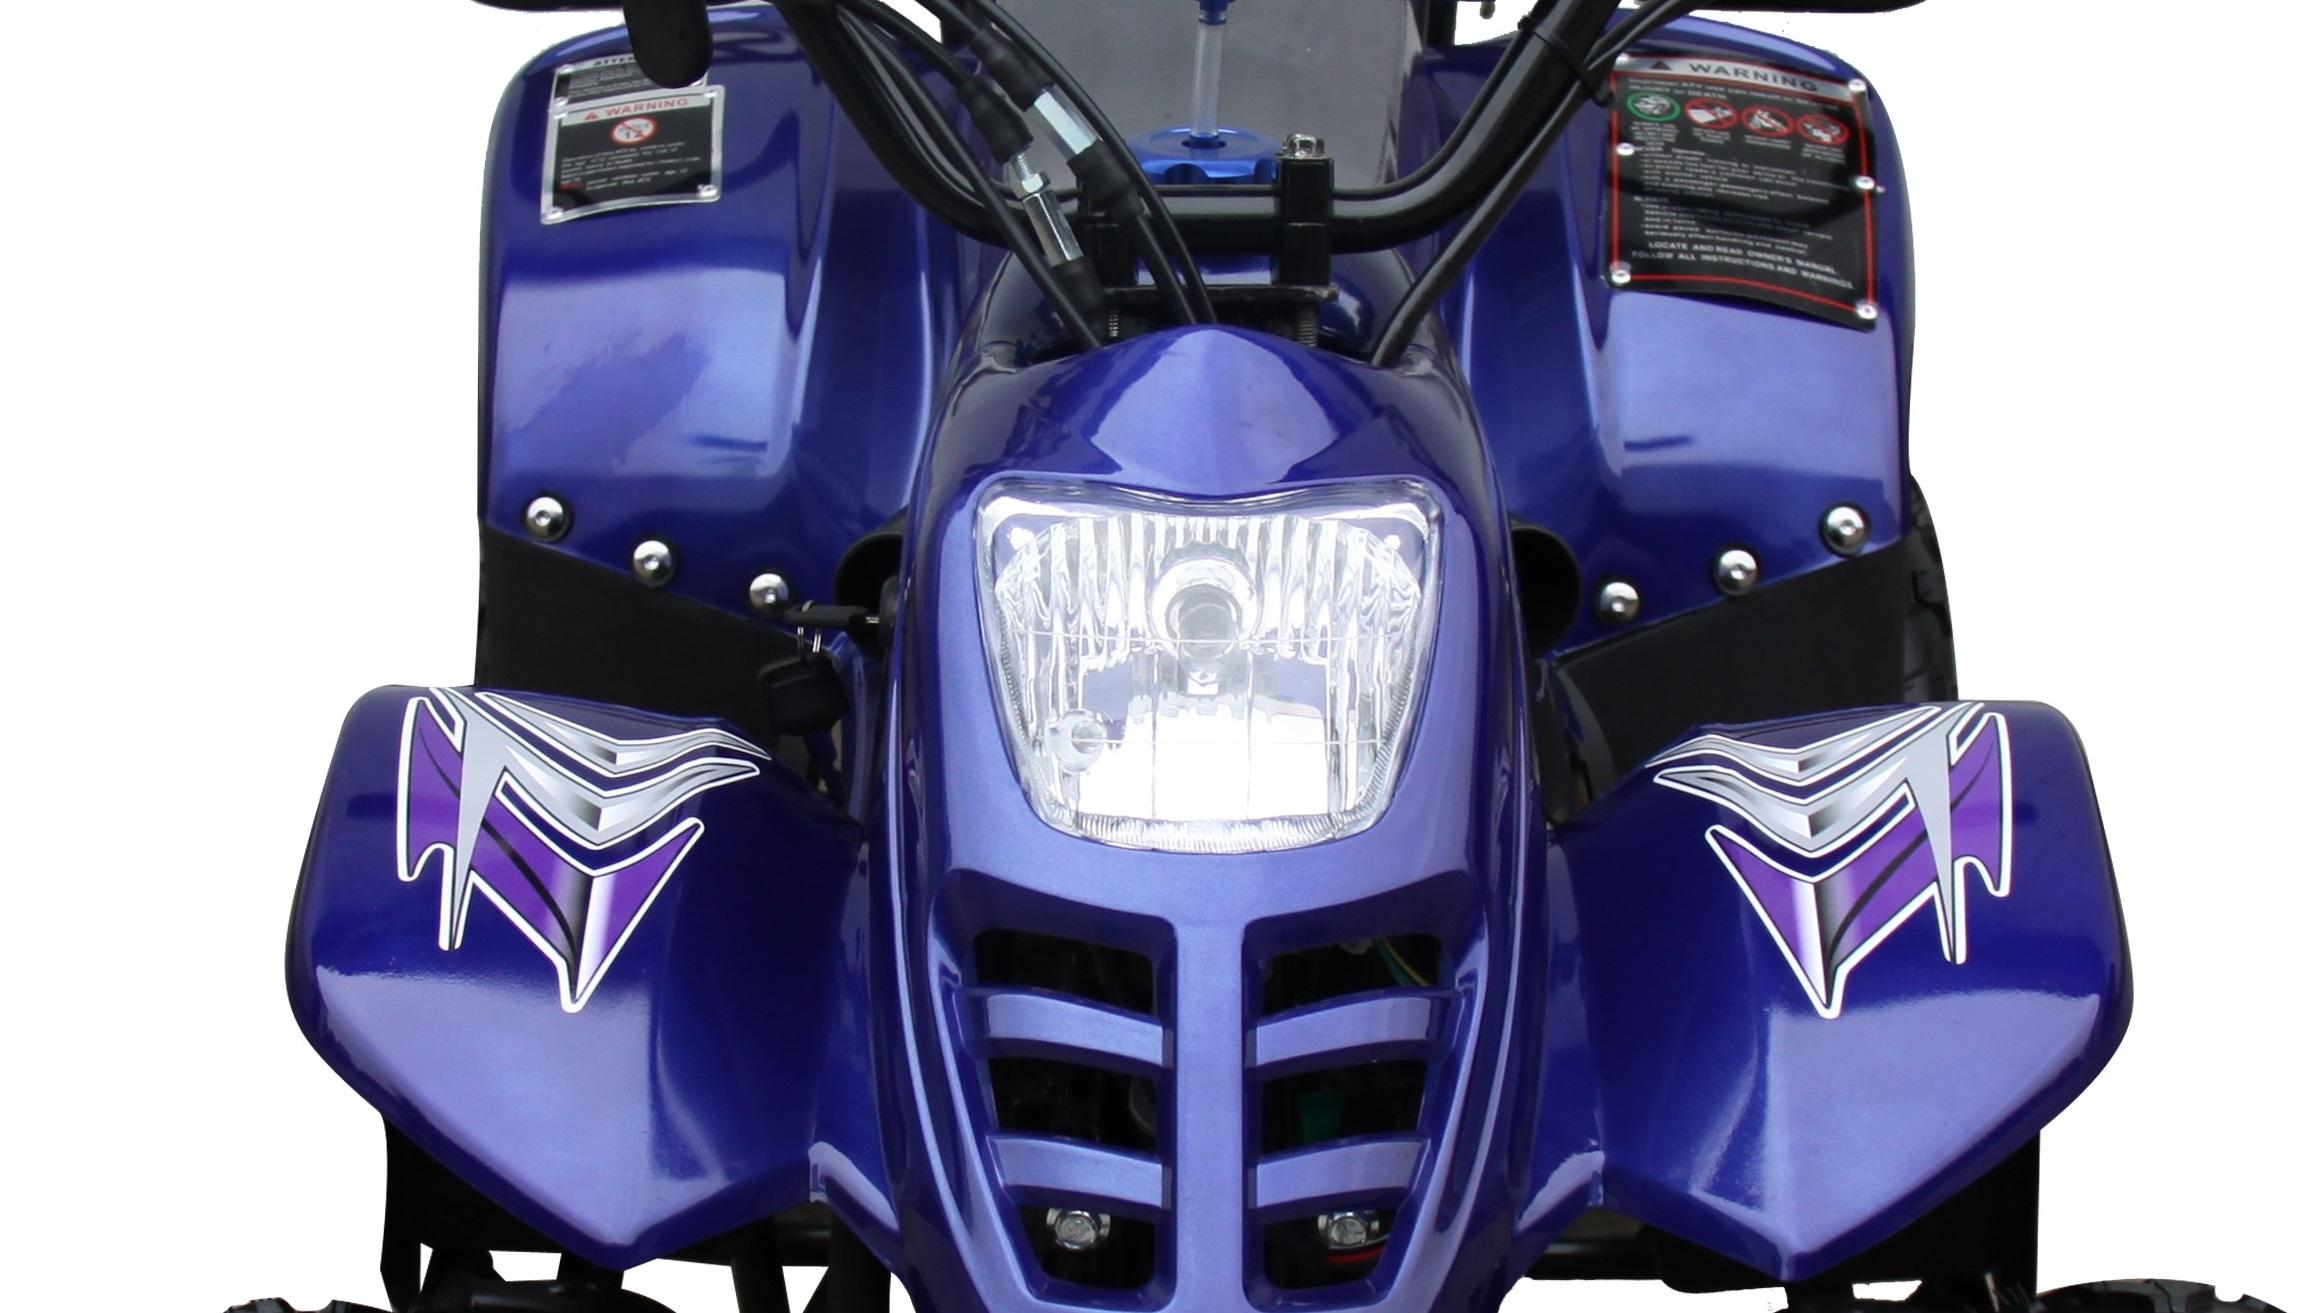 ... Panther Kids 110cc ATV Youth Quad 4 Wheeler Small Mini Size ...